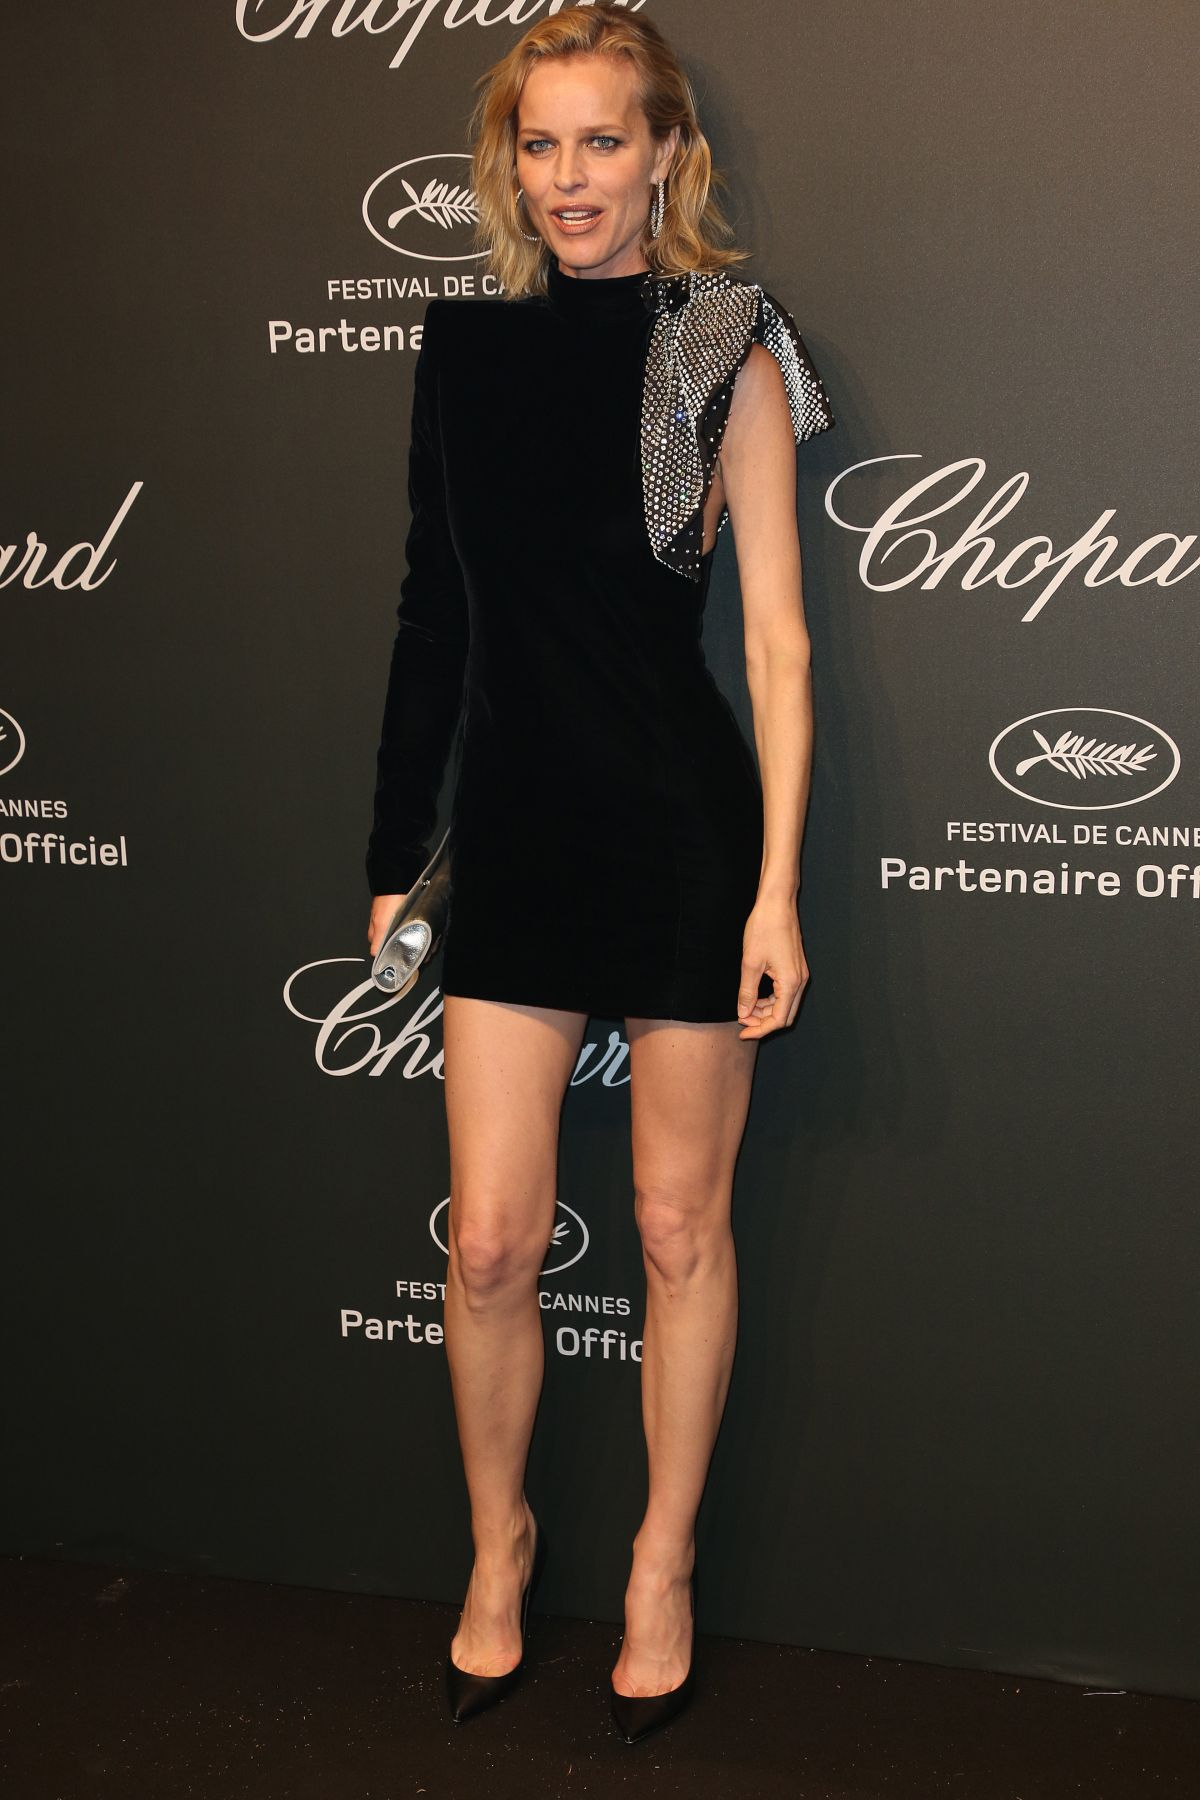 EVA HERZIGOVA at Chopard Party at 2017 Cannes Film Festival 05/19/2017